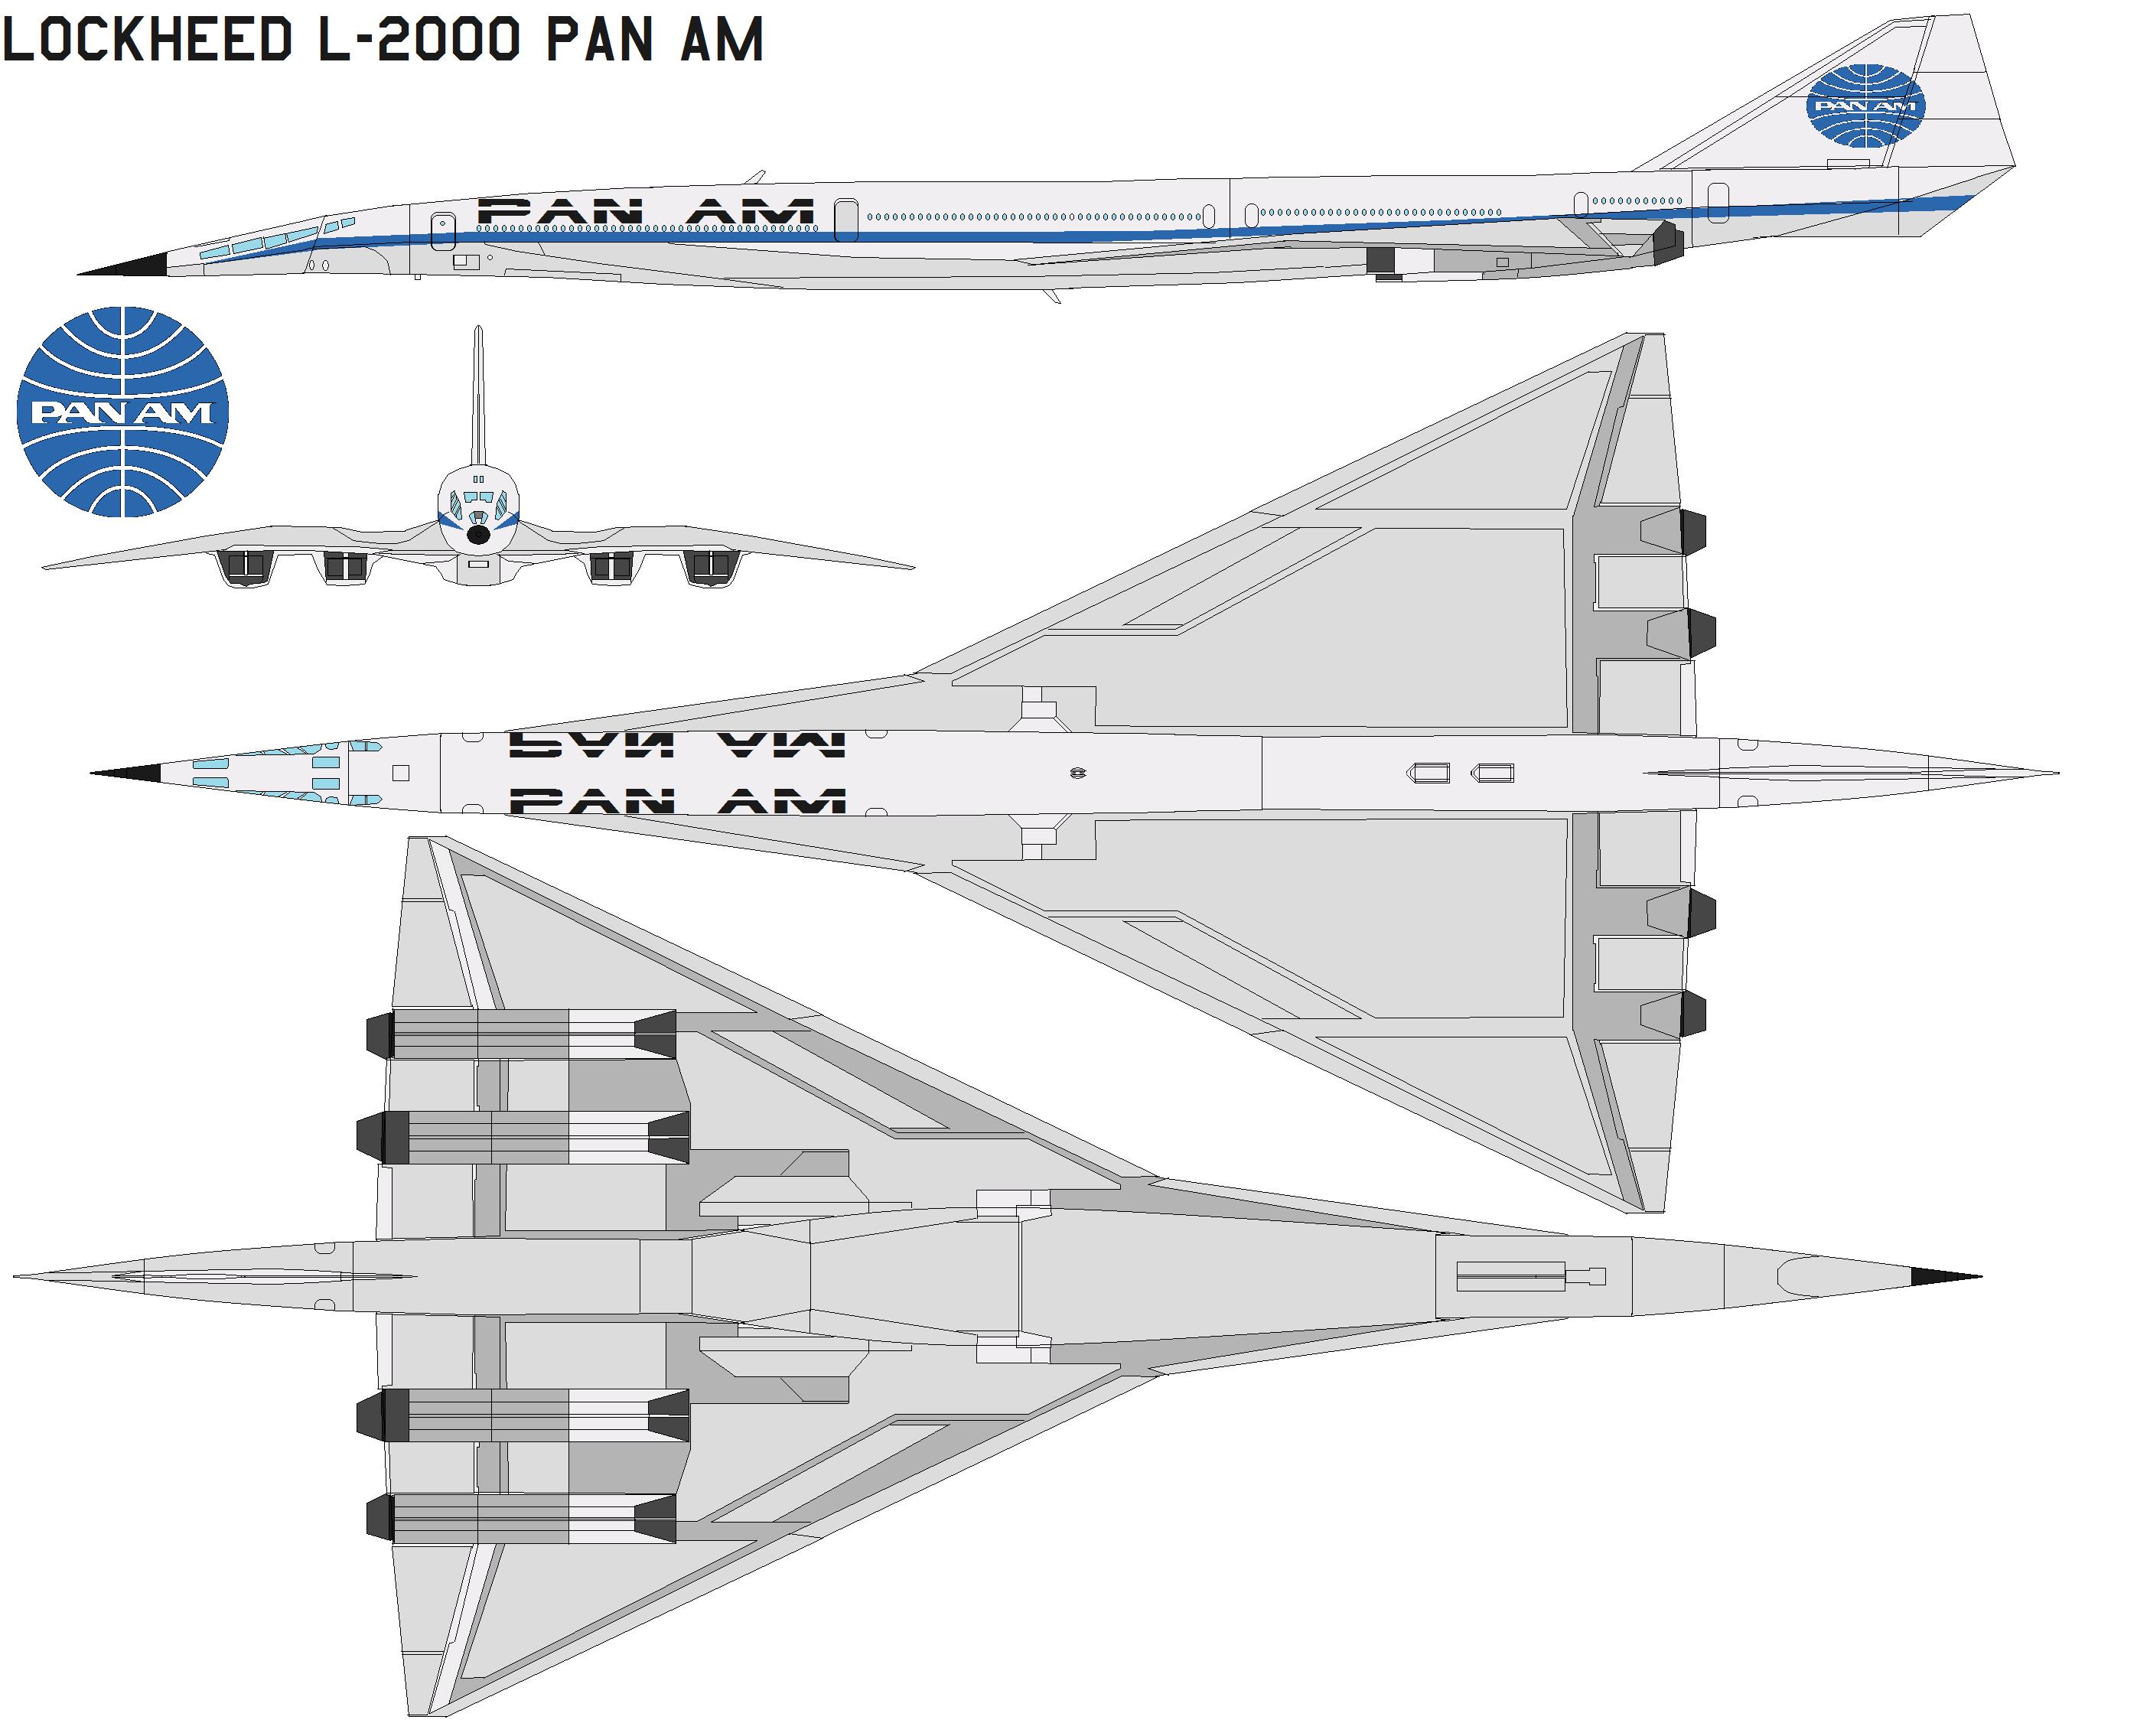 Lockheed L2000 pan am